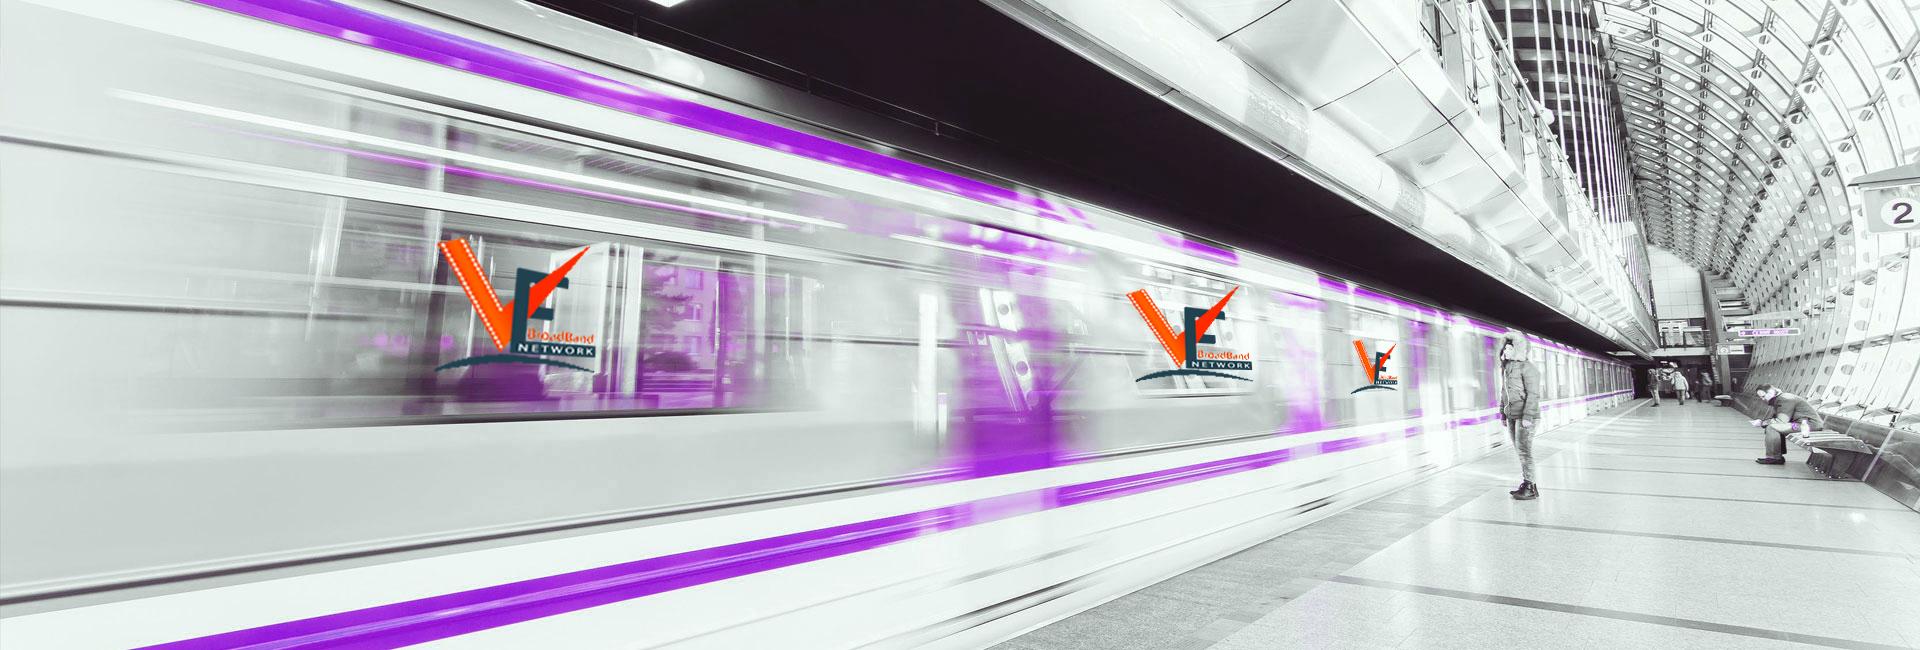 Welcome to VE Broadband Network